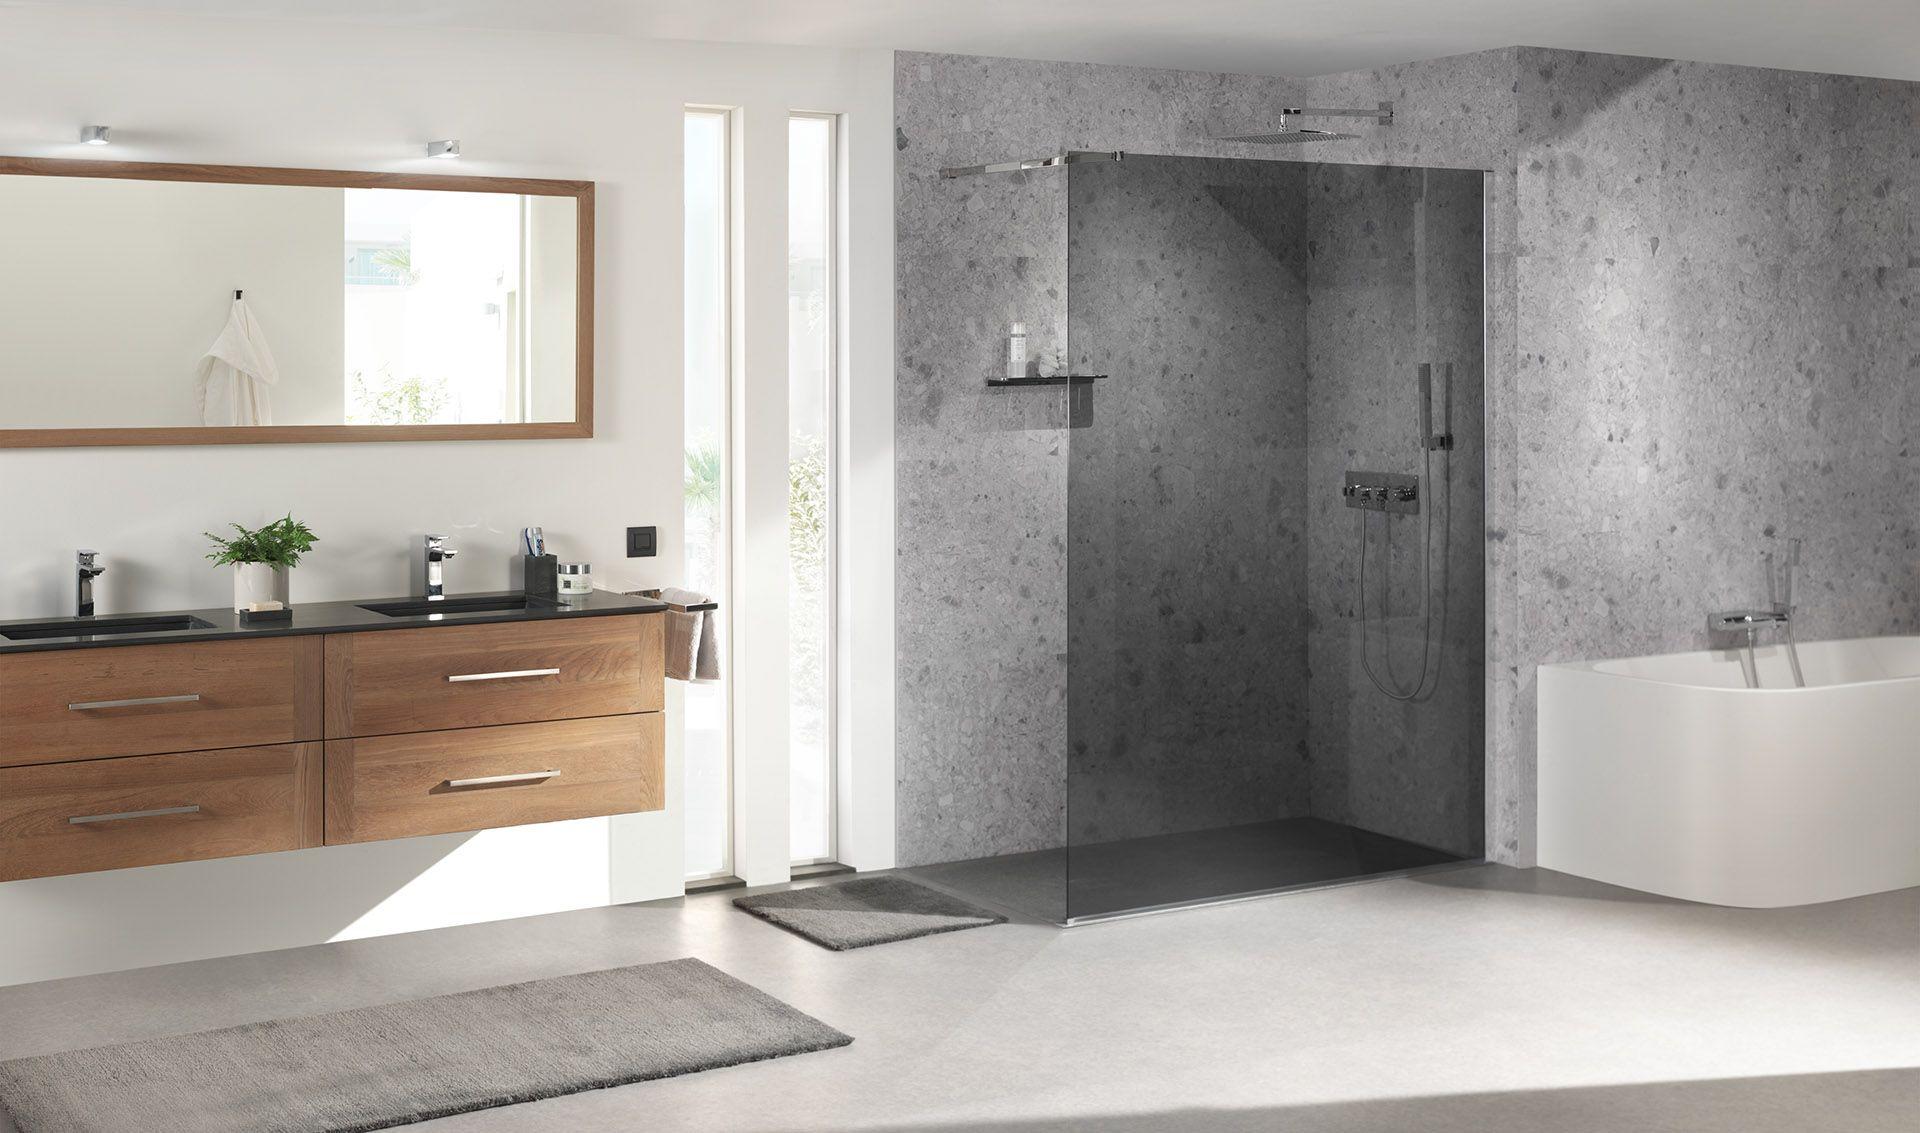 Inloopdouche Zonder Glas : X o balmani modular shower system inloopdouche grijs glas